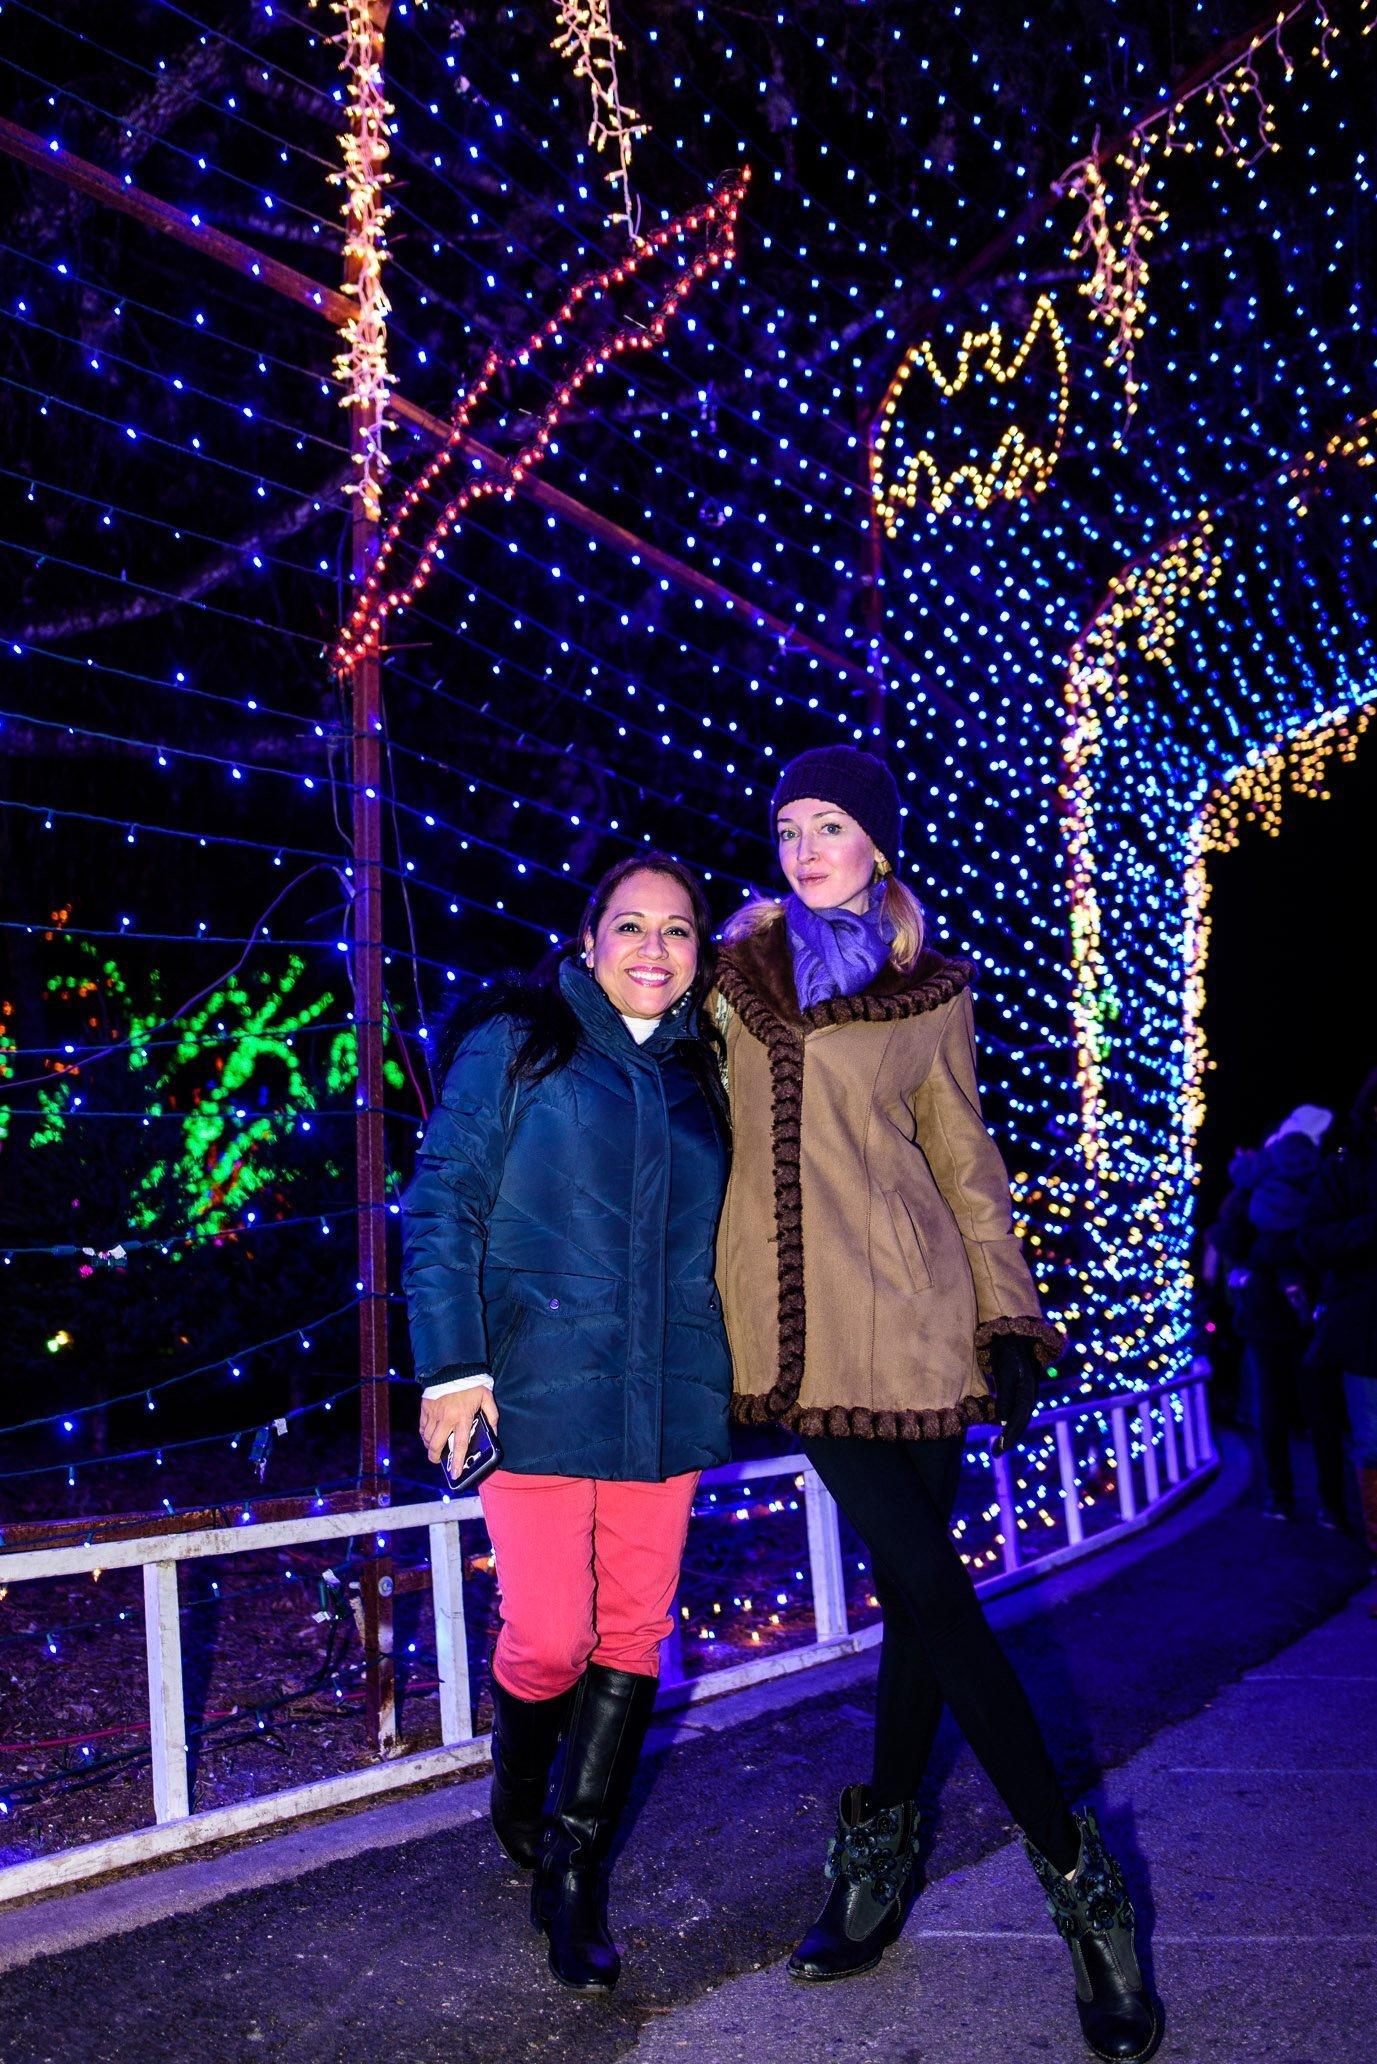 Trail of Lights, SuzyMae, Silvia